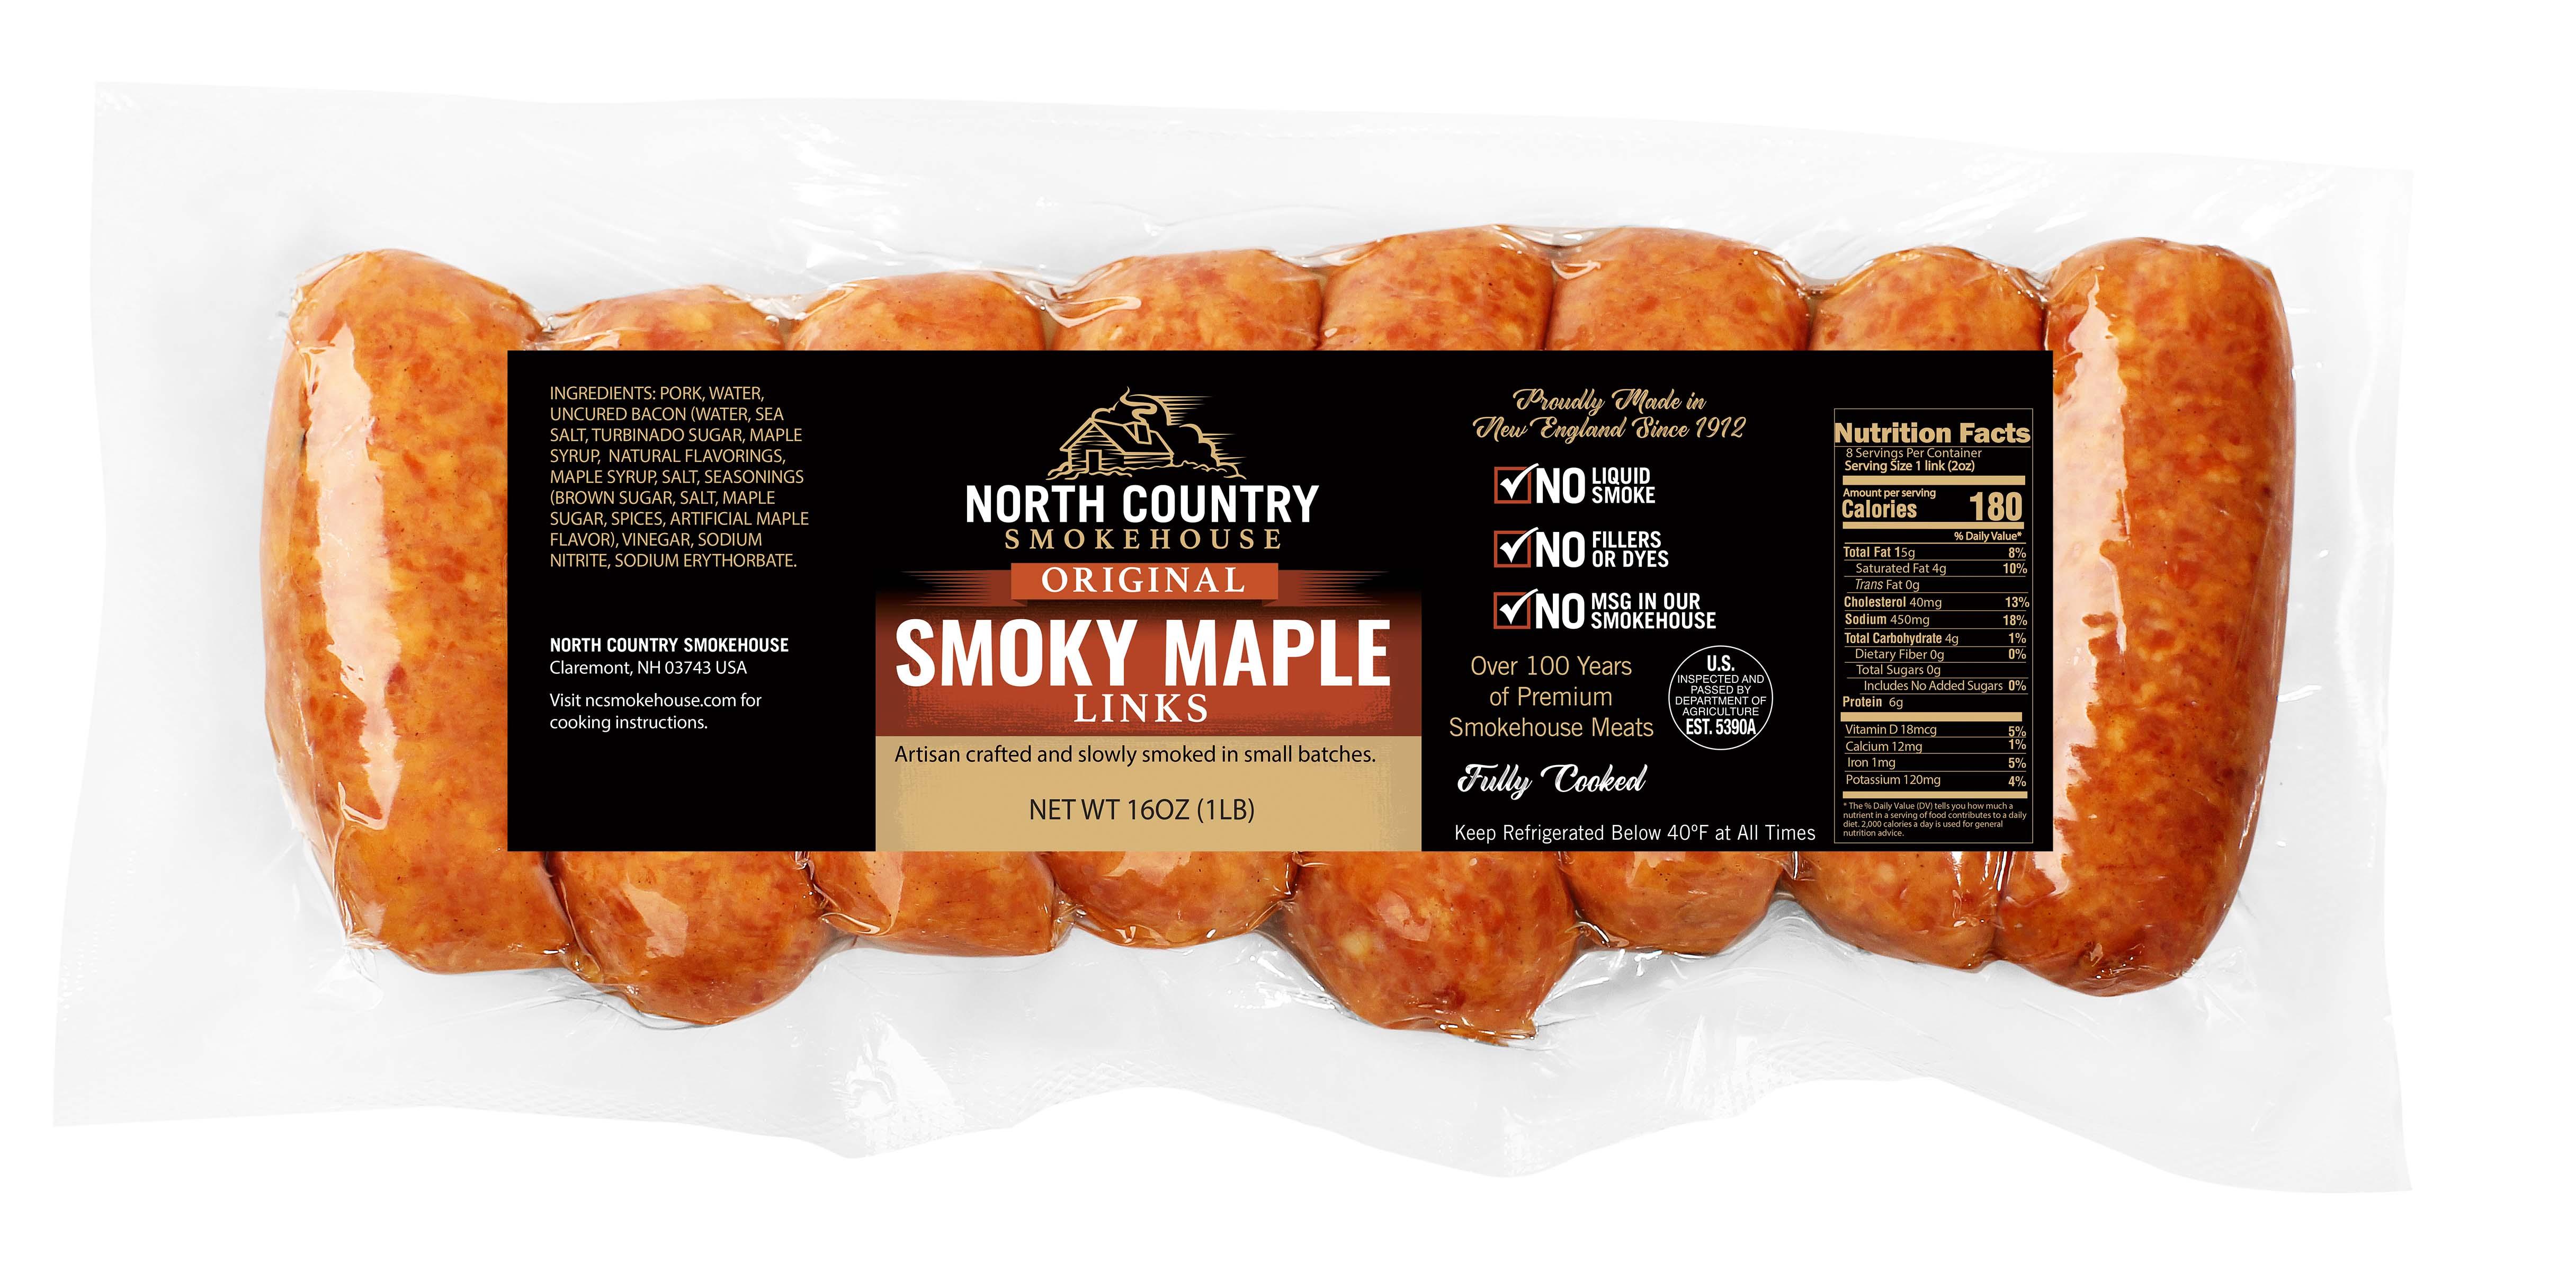 Original Smoky Maple Sausage - 3, 1lb. packages